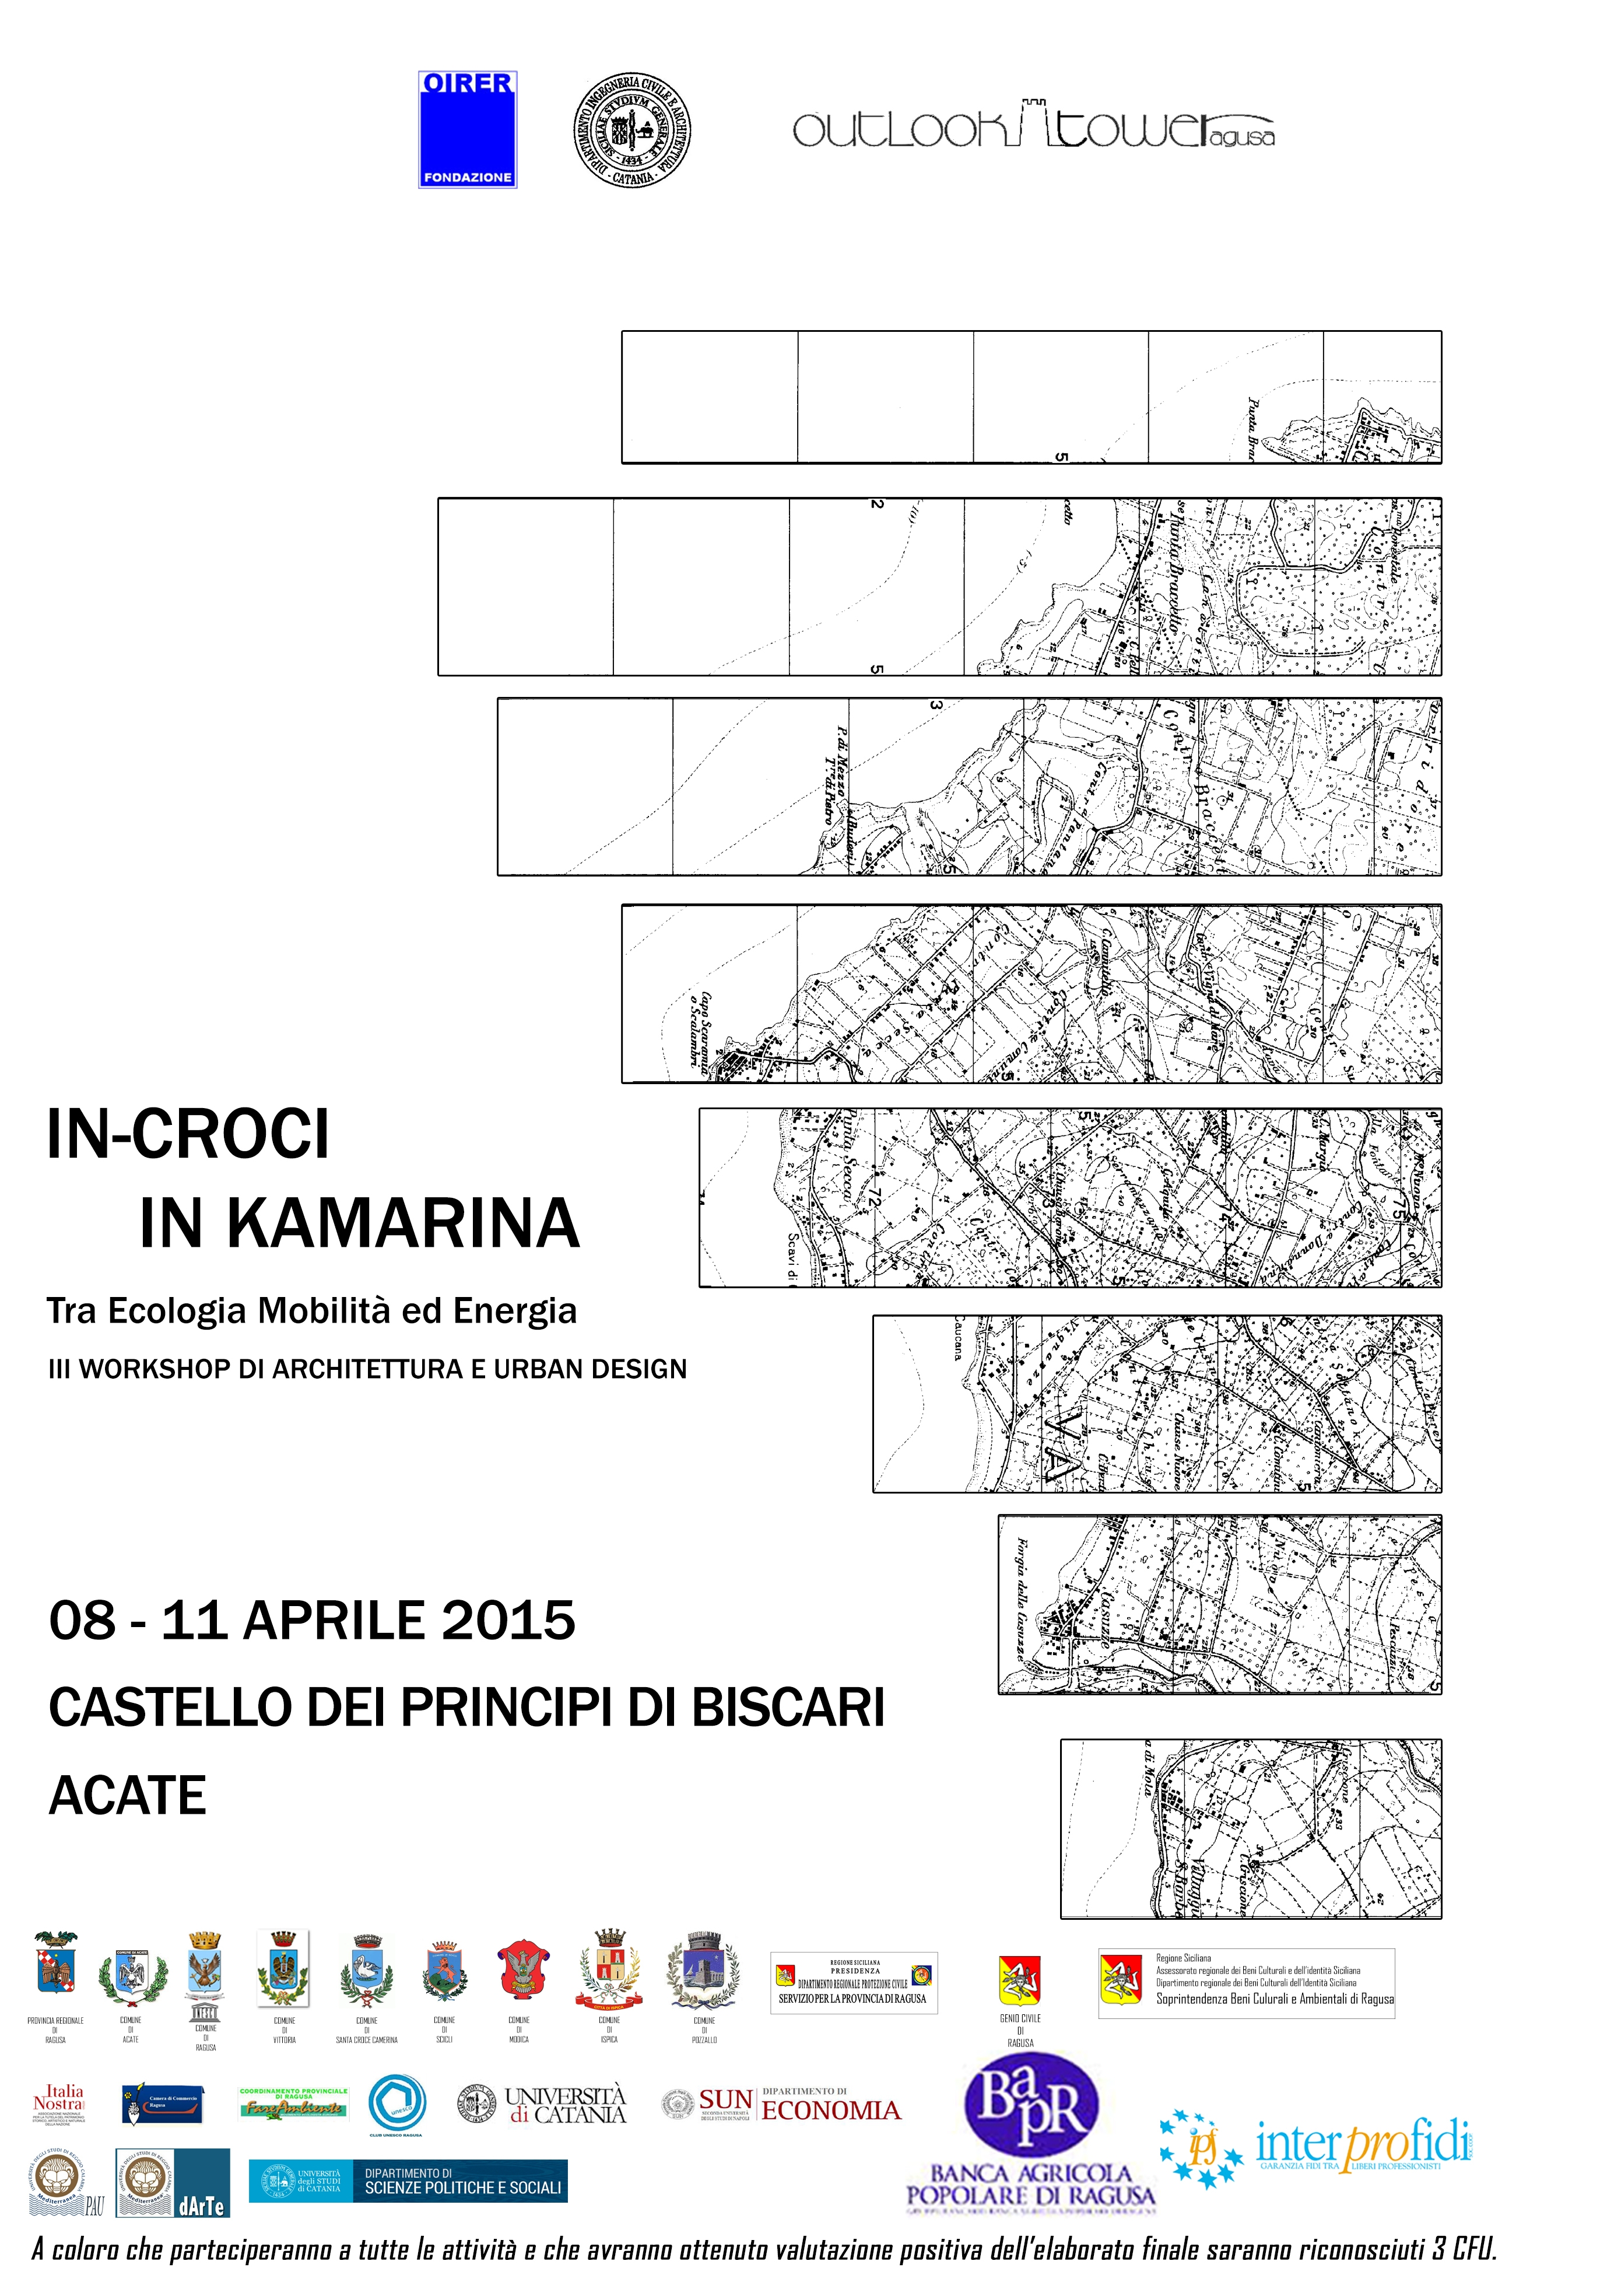 "Acate. Terza edizione del Workshop ""In-Croci in Kamarina"". Castello dei Principi di Biscari, 8-9-10-11 aprile."